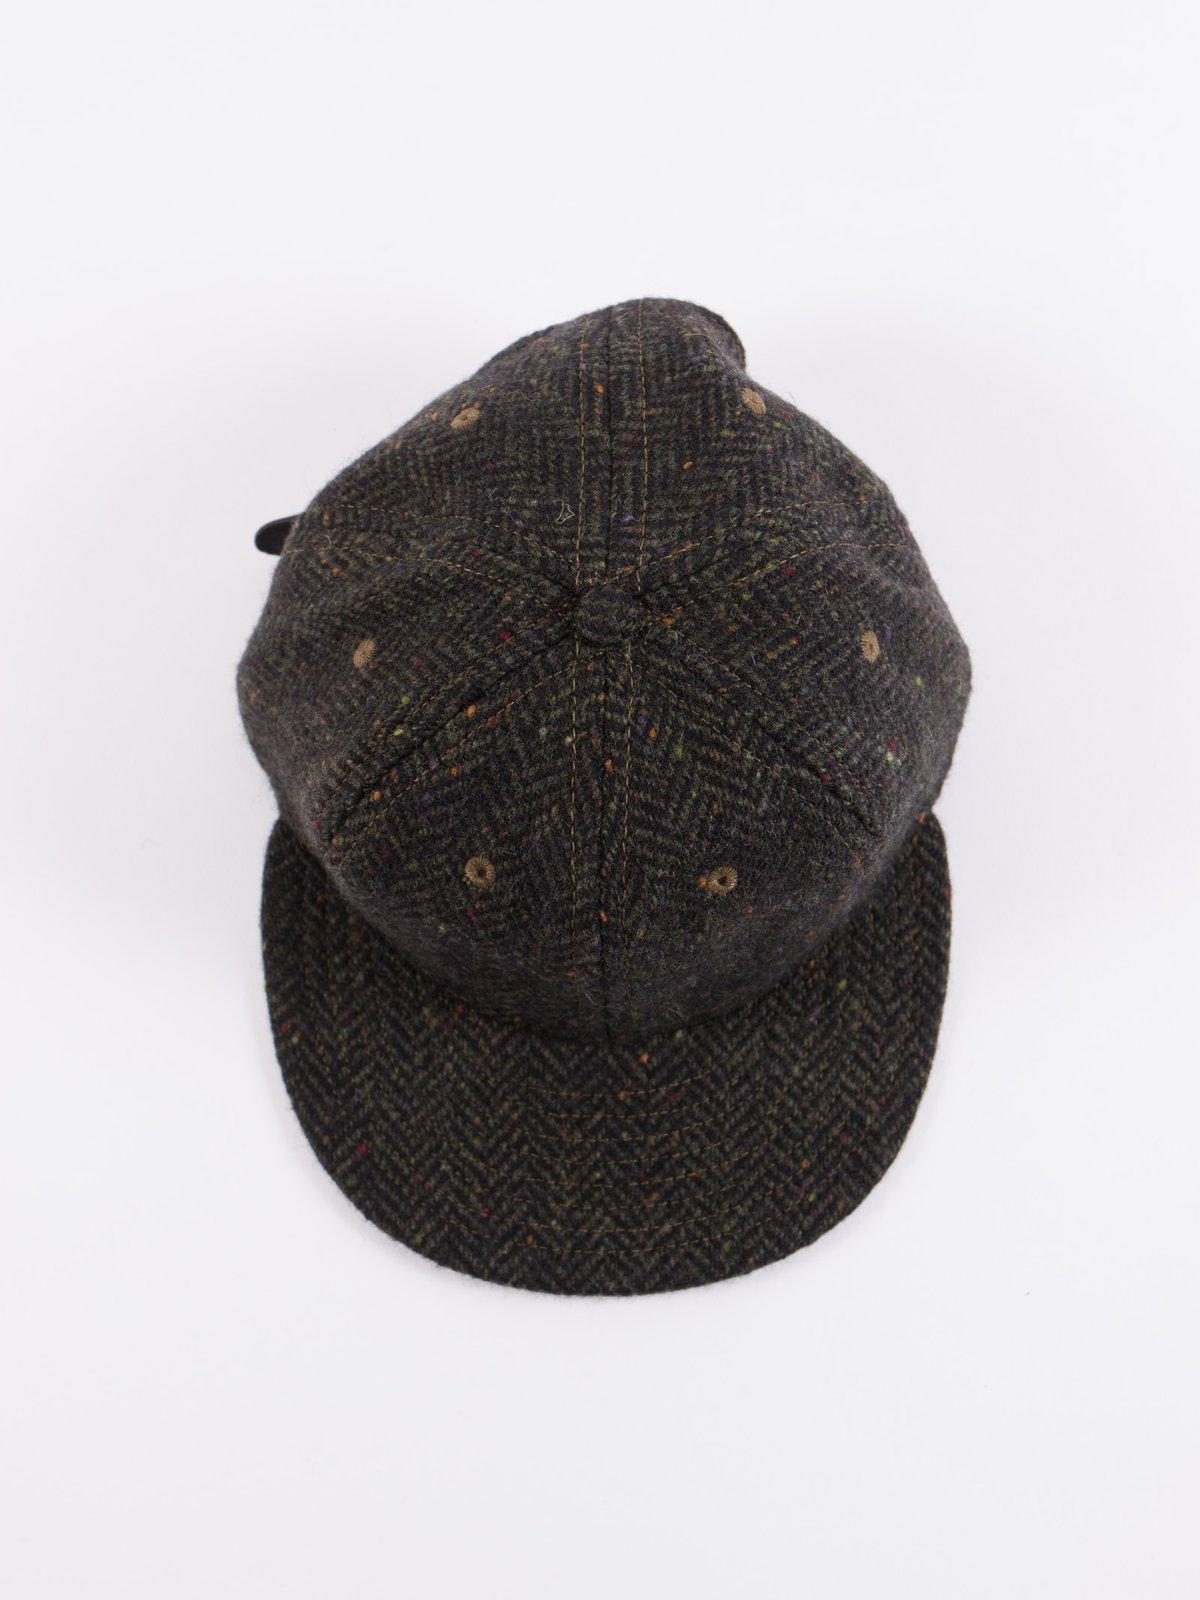 Olive HB Tweed NIer 6 Panel Ballcap - Image 5